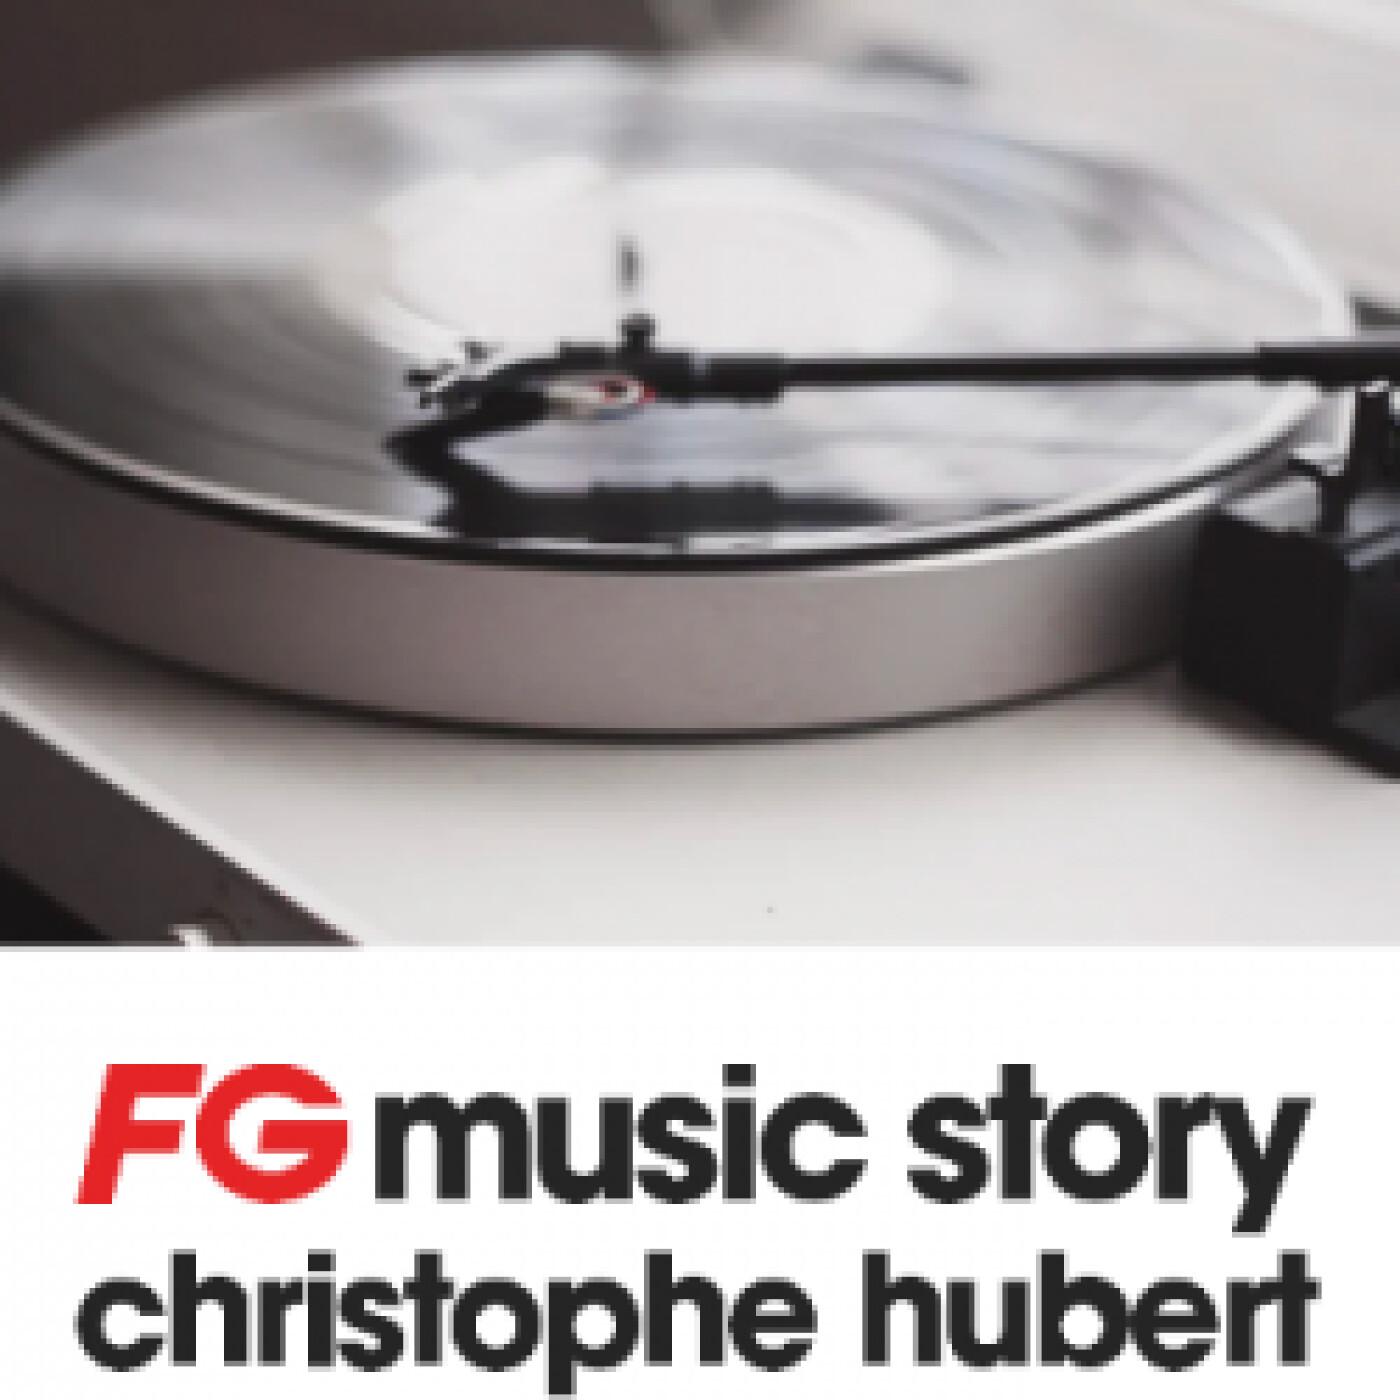 FG MUSIC STORY : ELDERBROOK